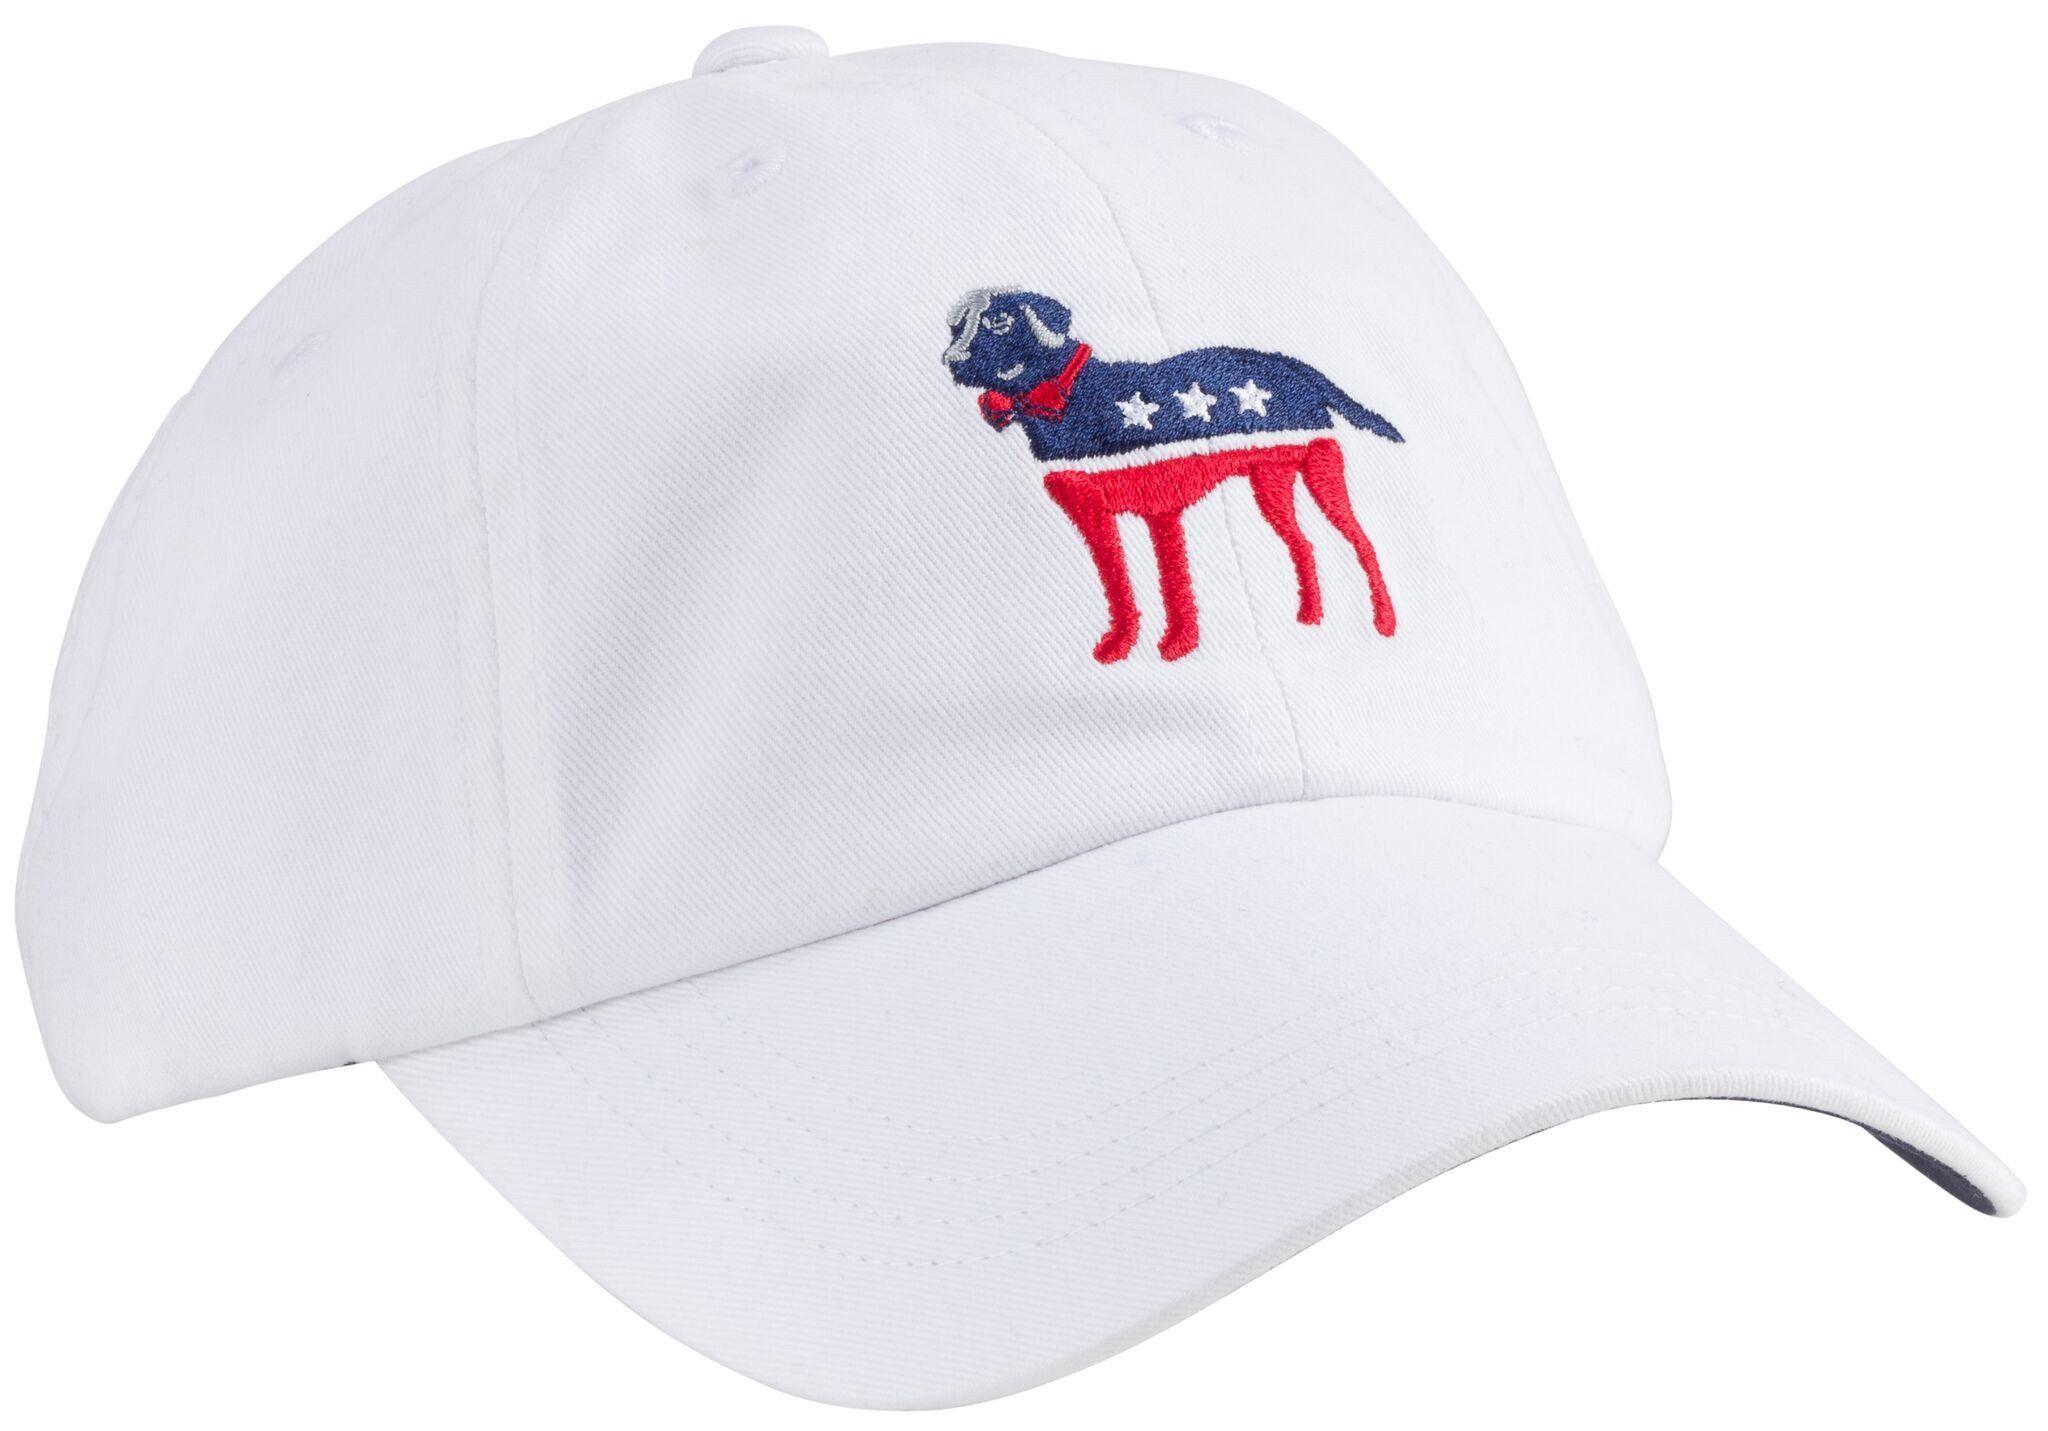 Frat Hat: White Party Animal